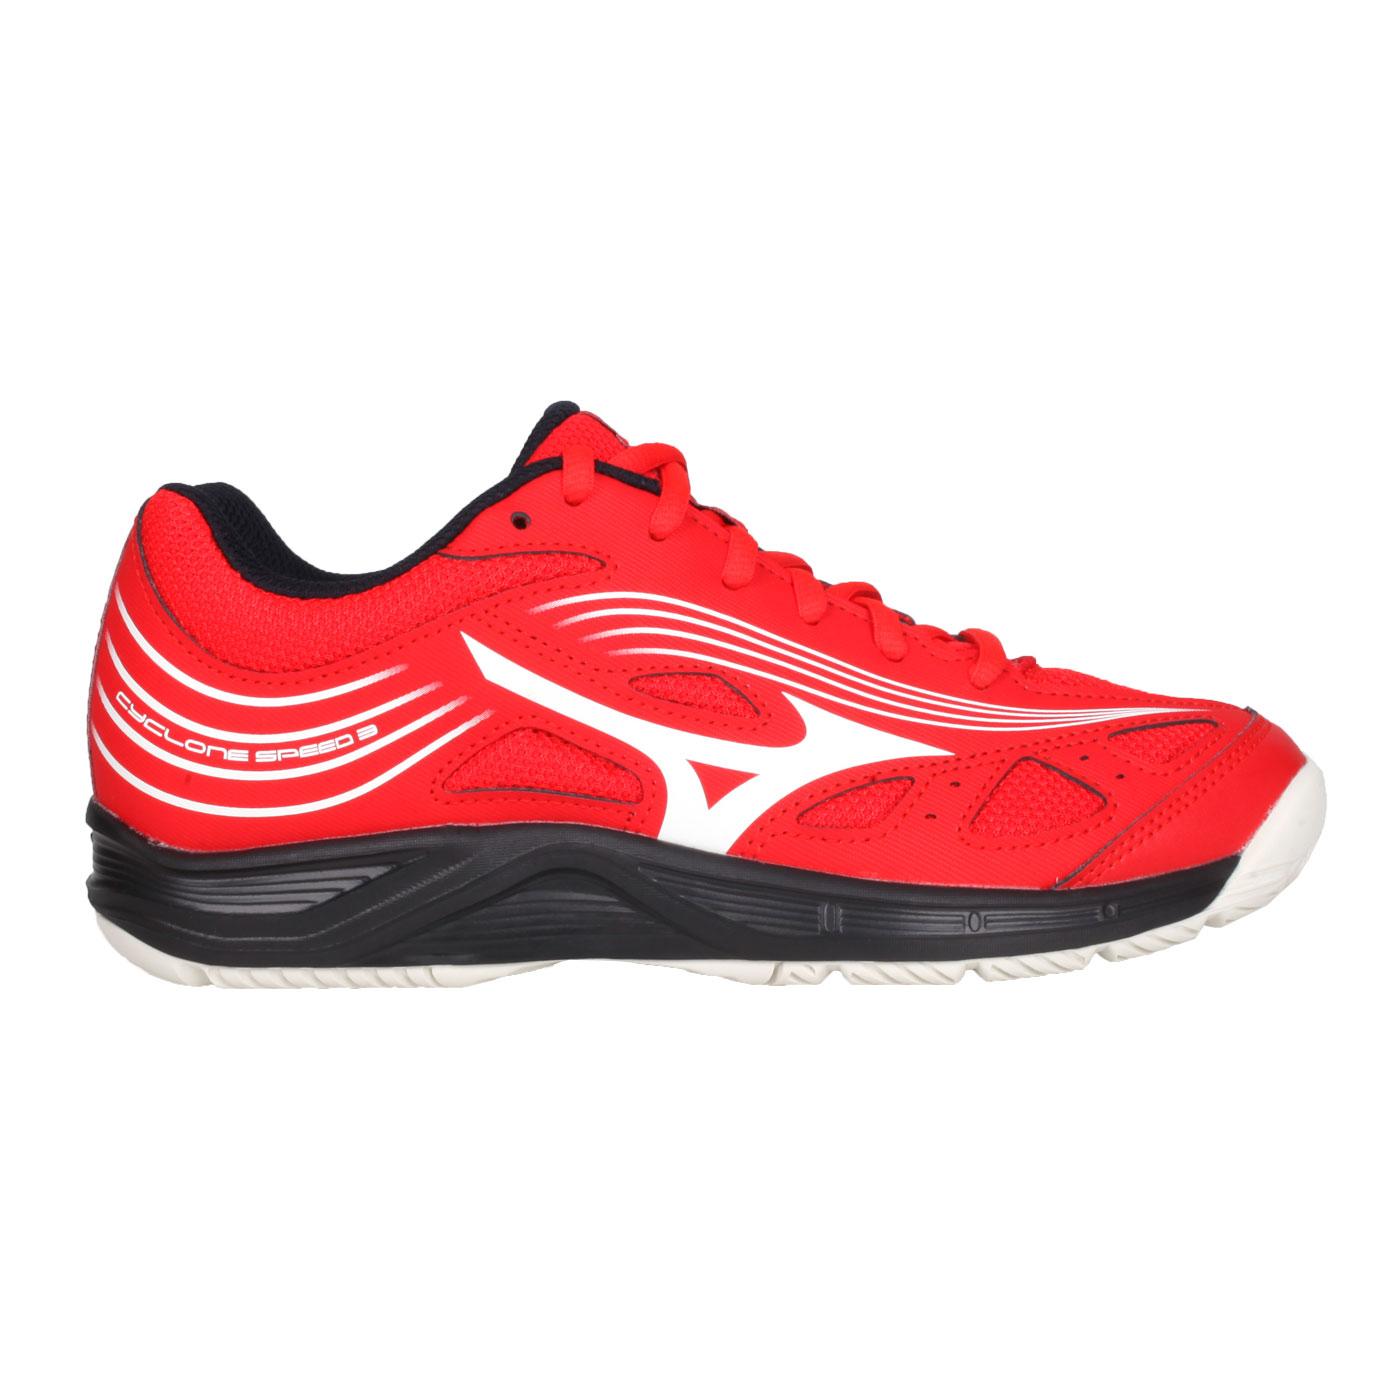 MIZUNO 排球鞋  @CYCLONE SPEED 3@V1GA218063 - 紅白黑